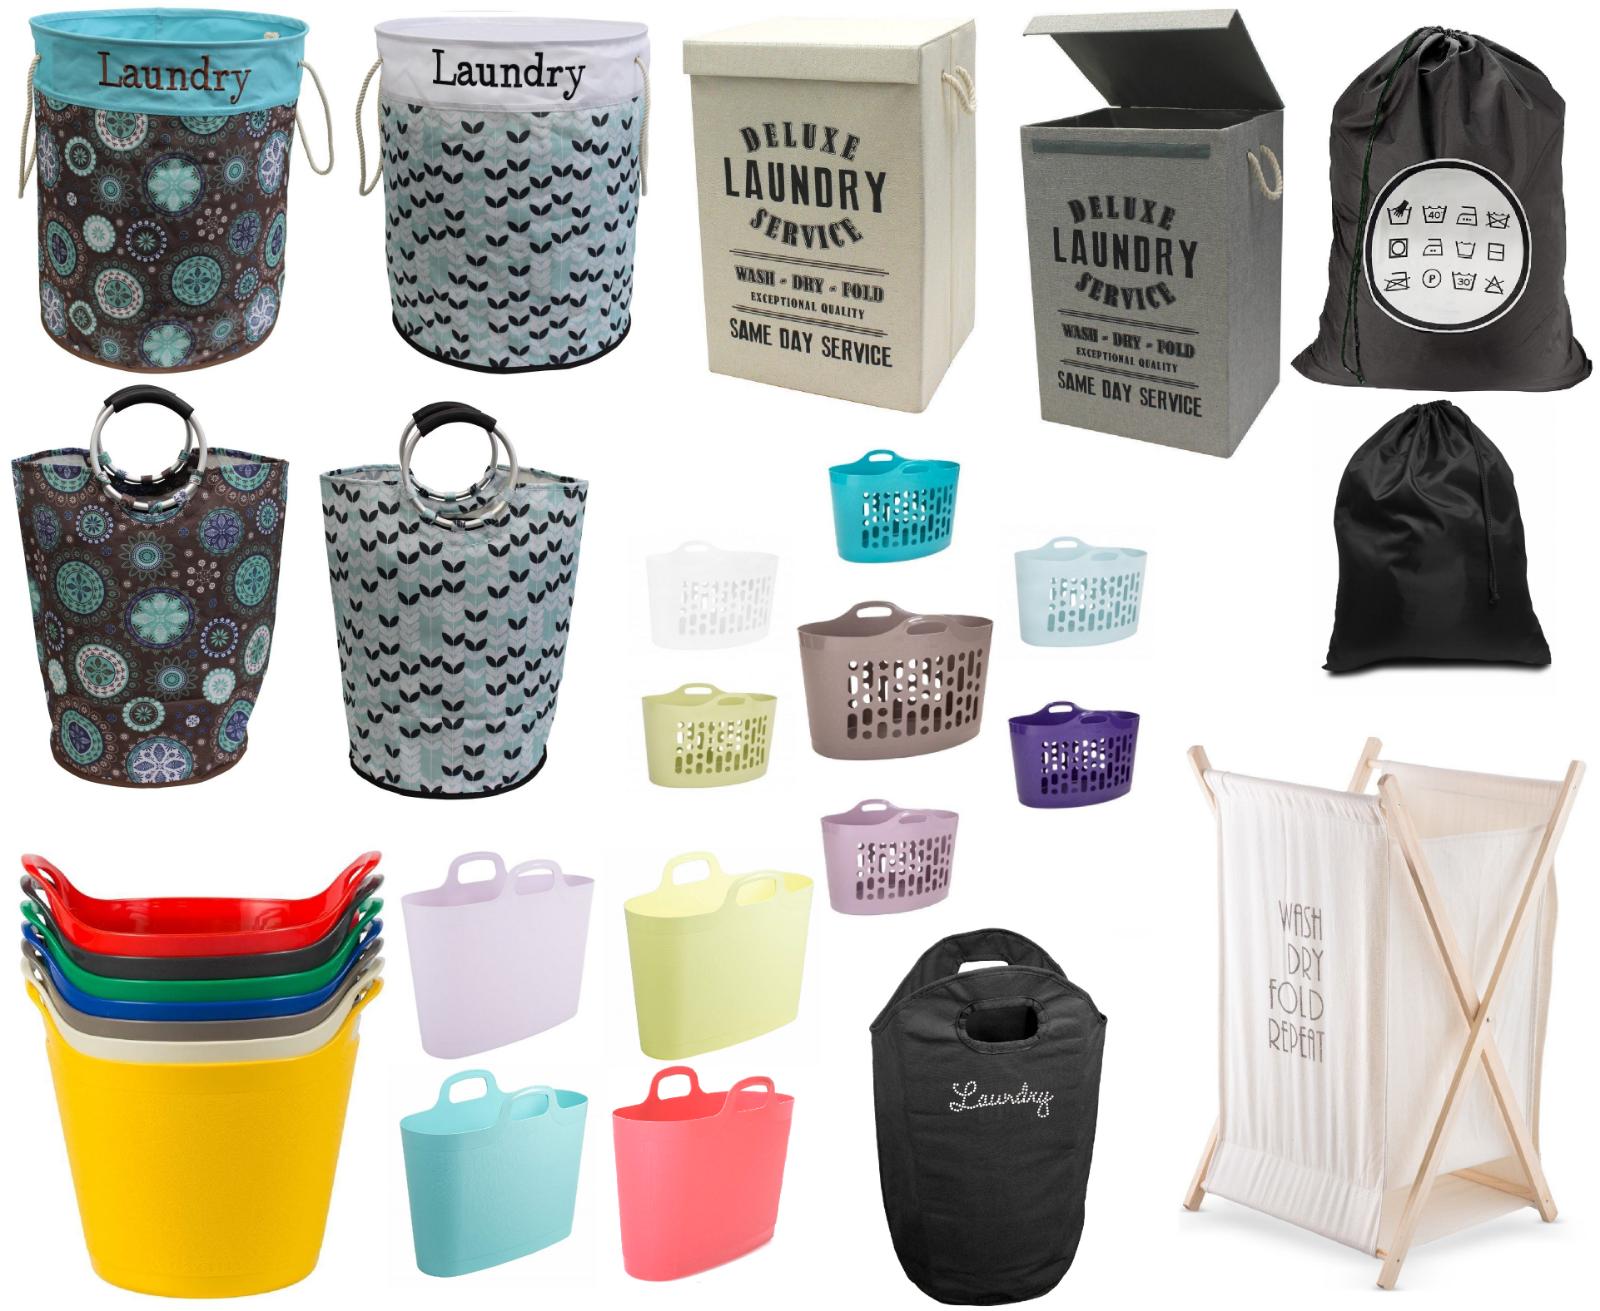 Dirty Laundry Washing Clothes Basket Bin Storage Bag Home Bathroom Hamper Large Ebay